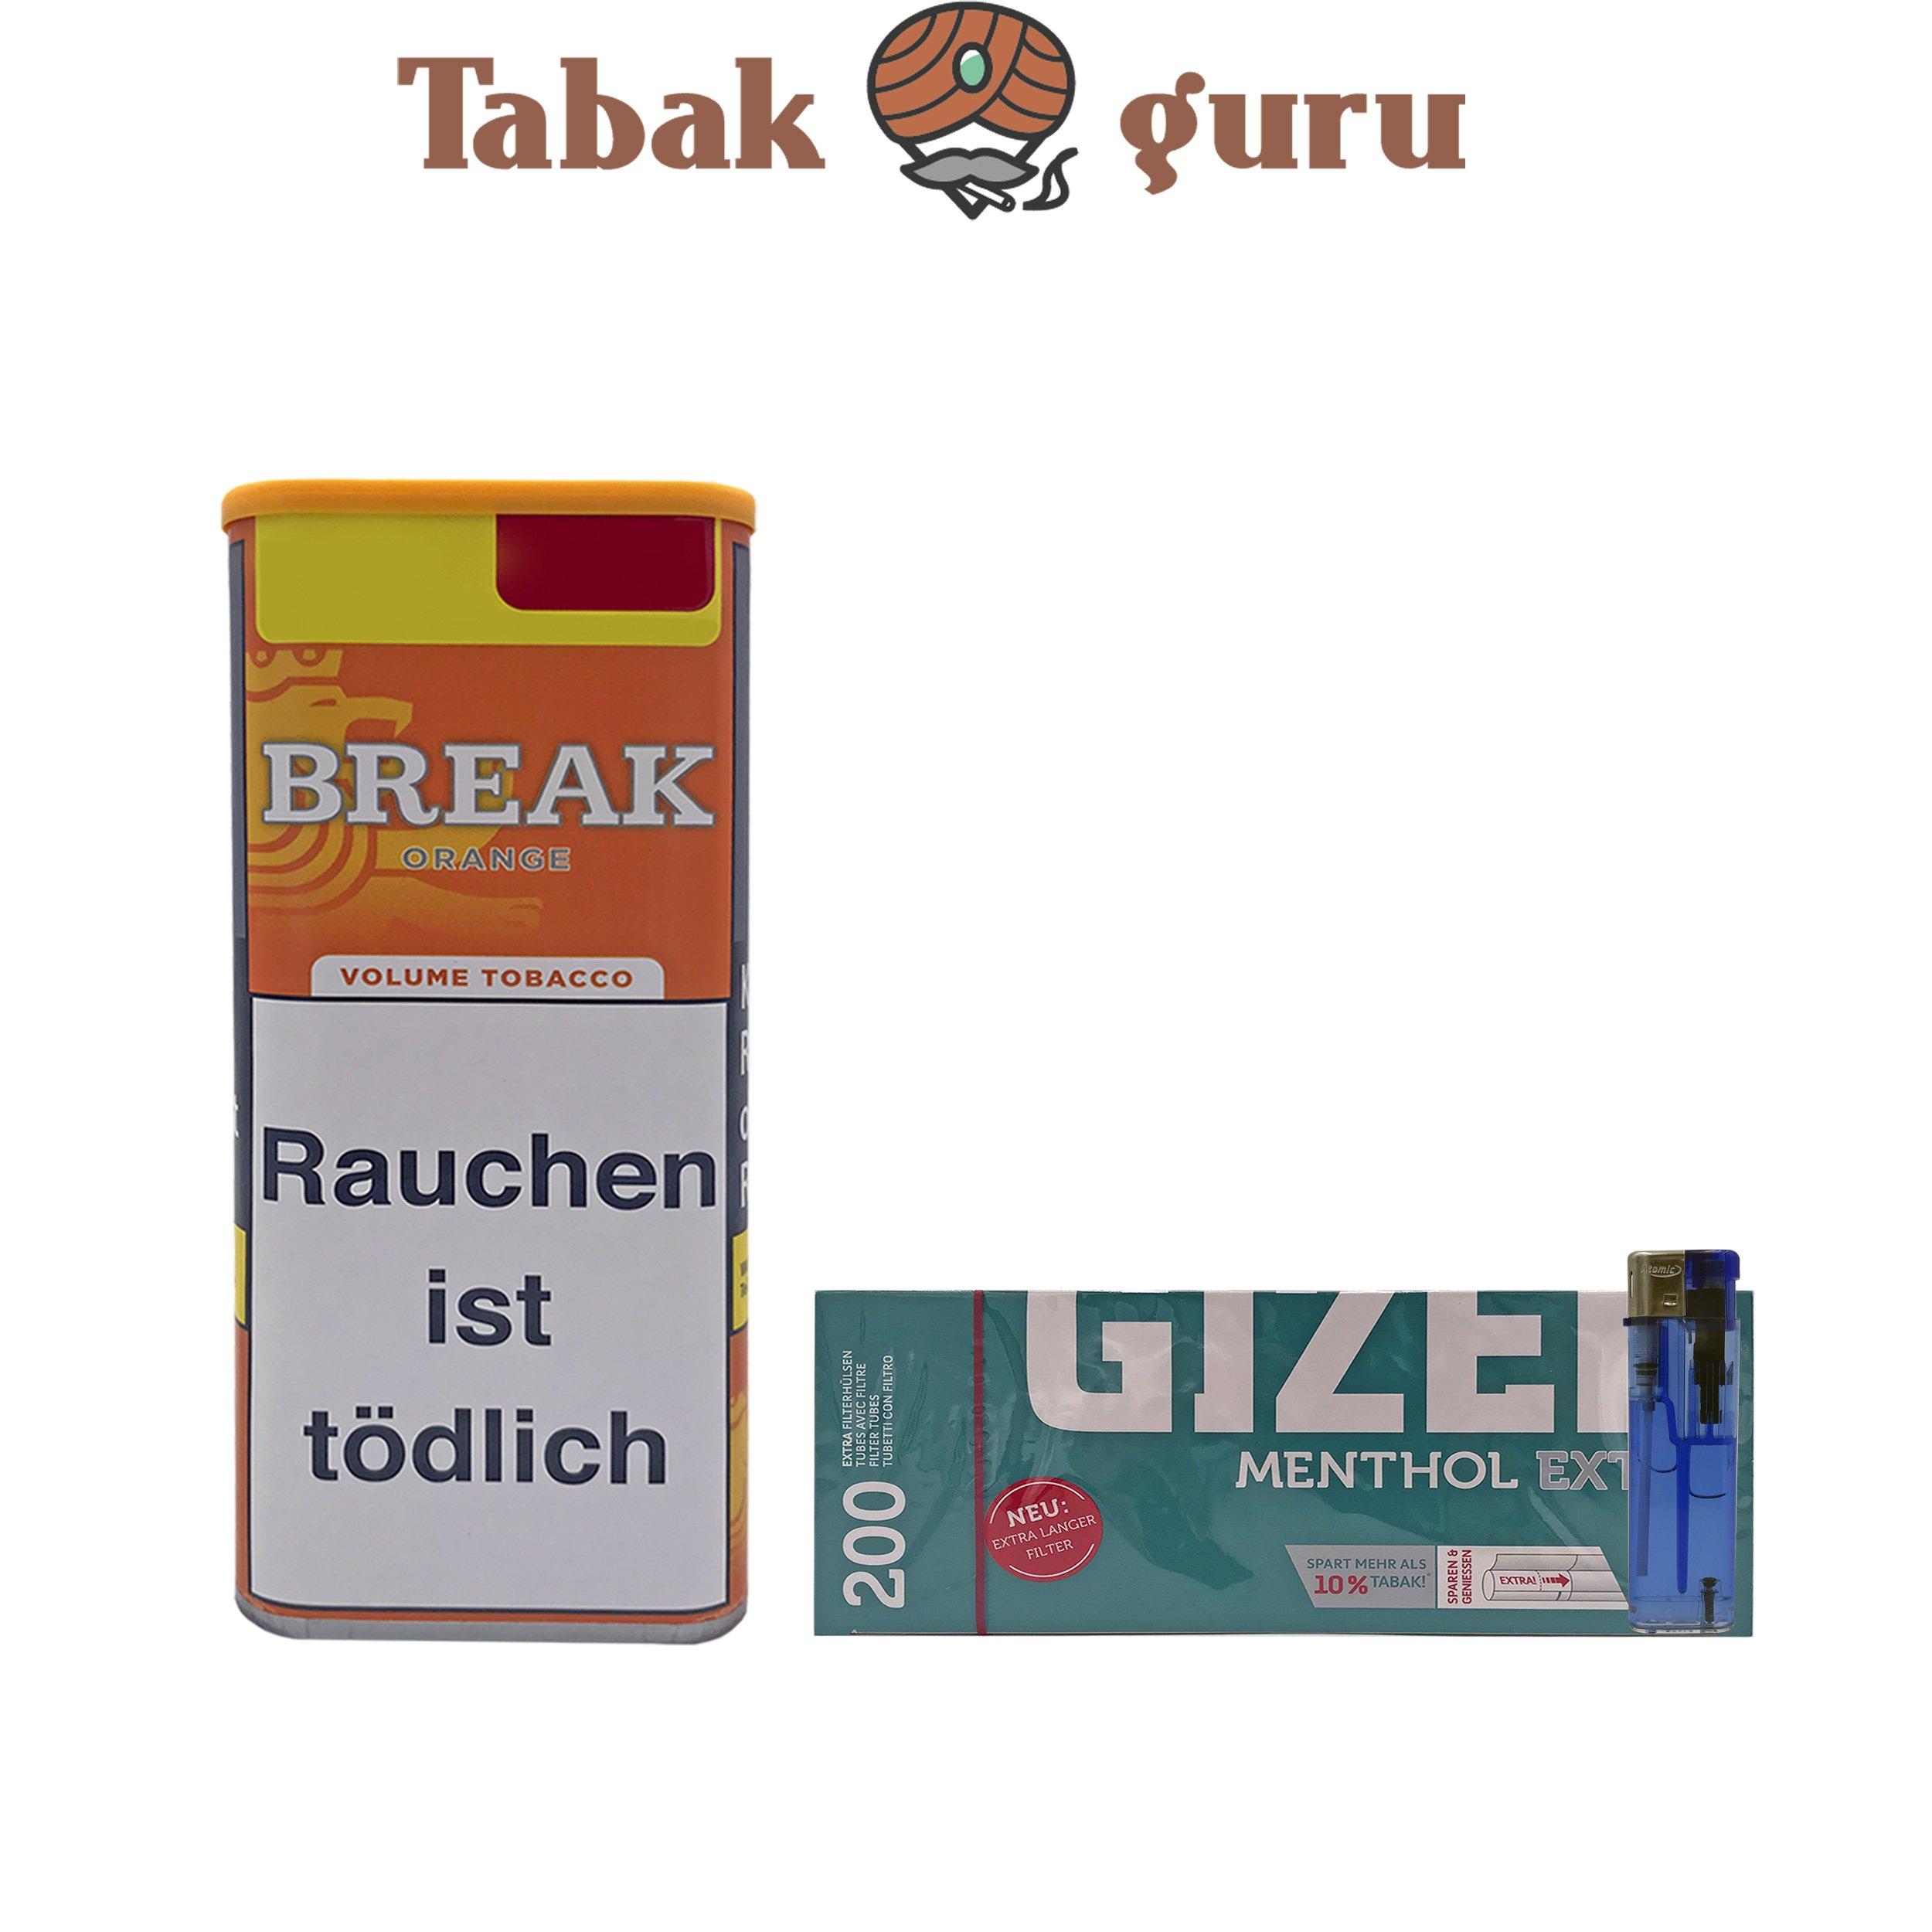 1x Break Orange 110g Dose Volumentabak + 200 Gizeh Menthol Extra Hülsen + 1 Feuerzeug